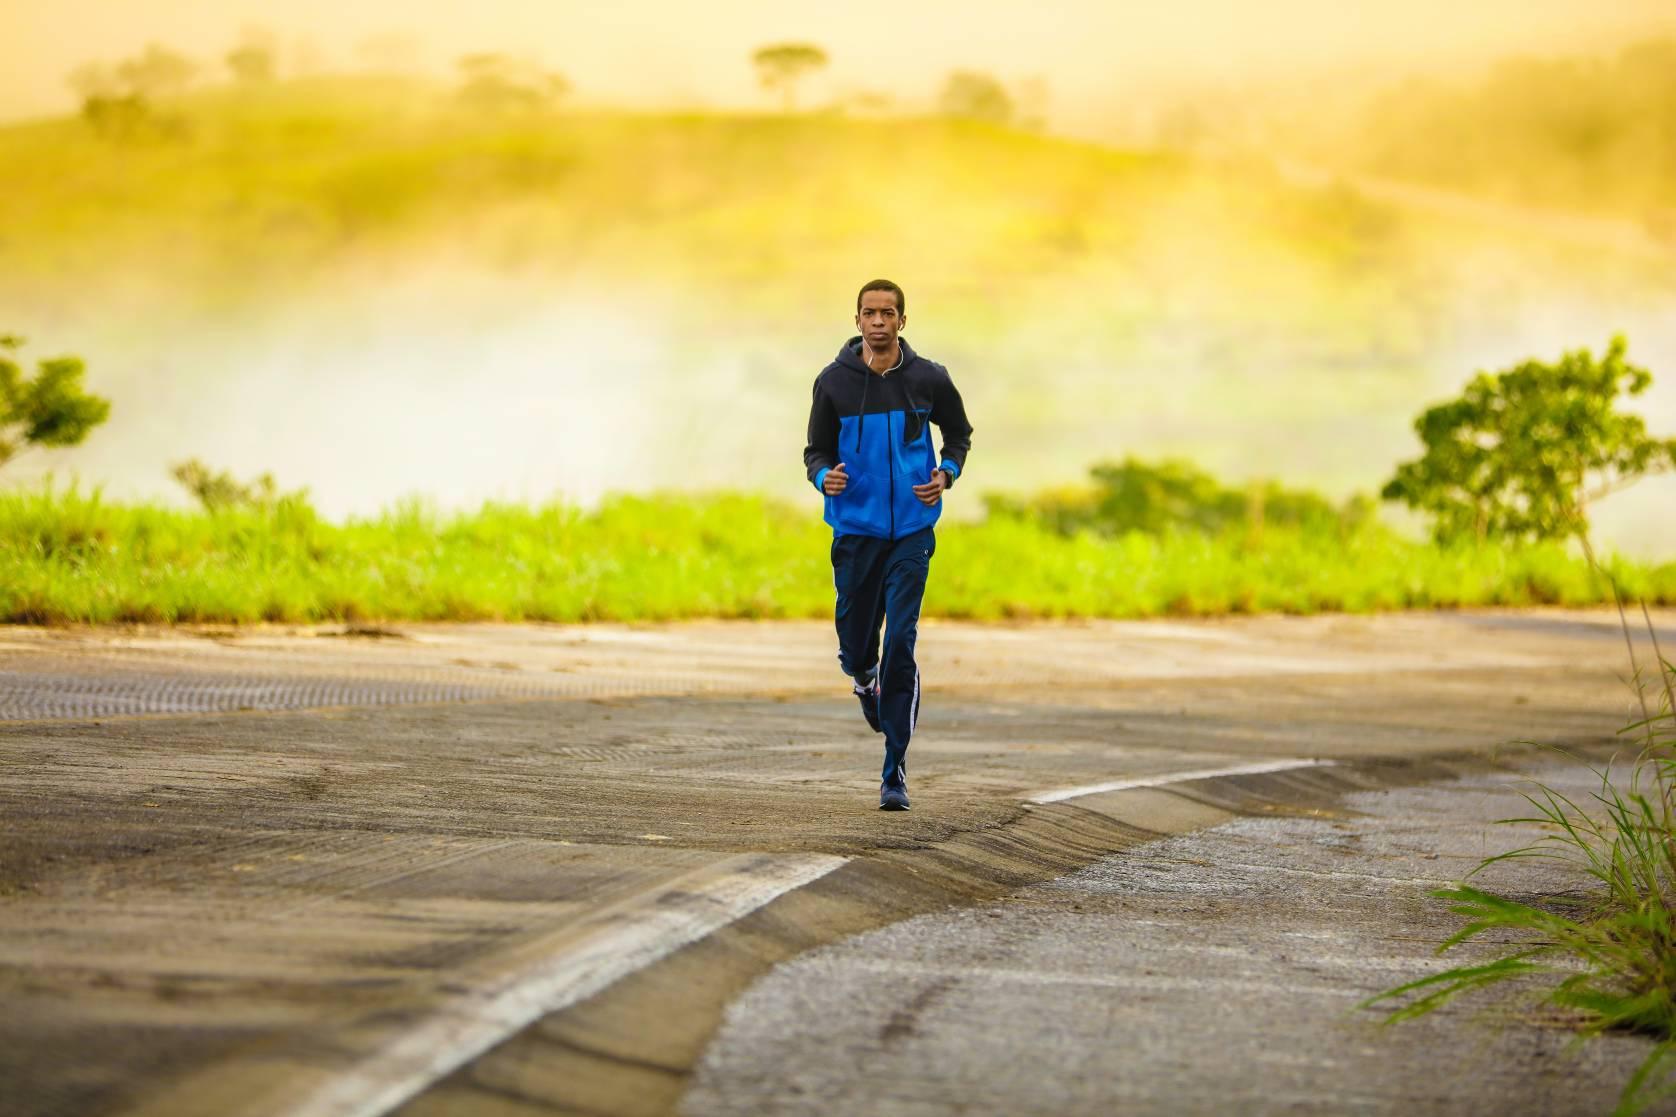 Man running in tracksuit